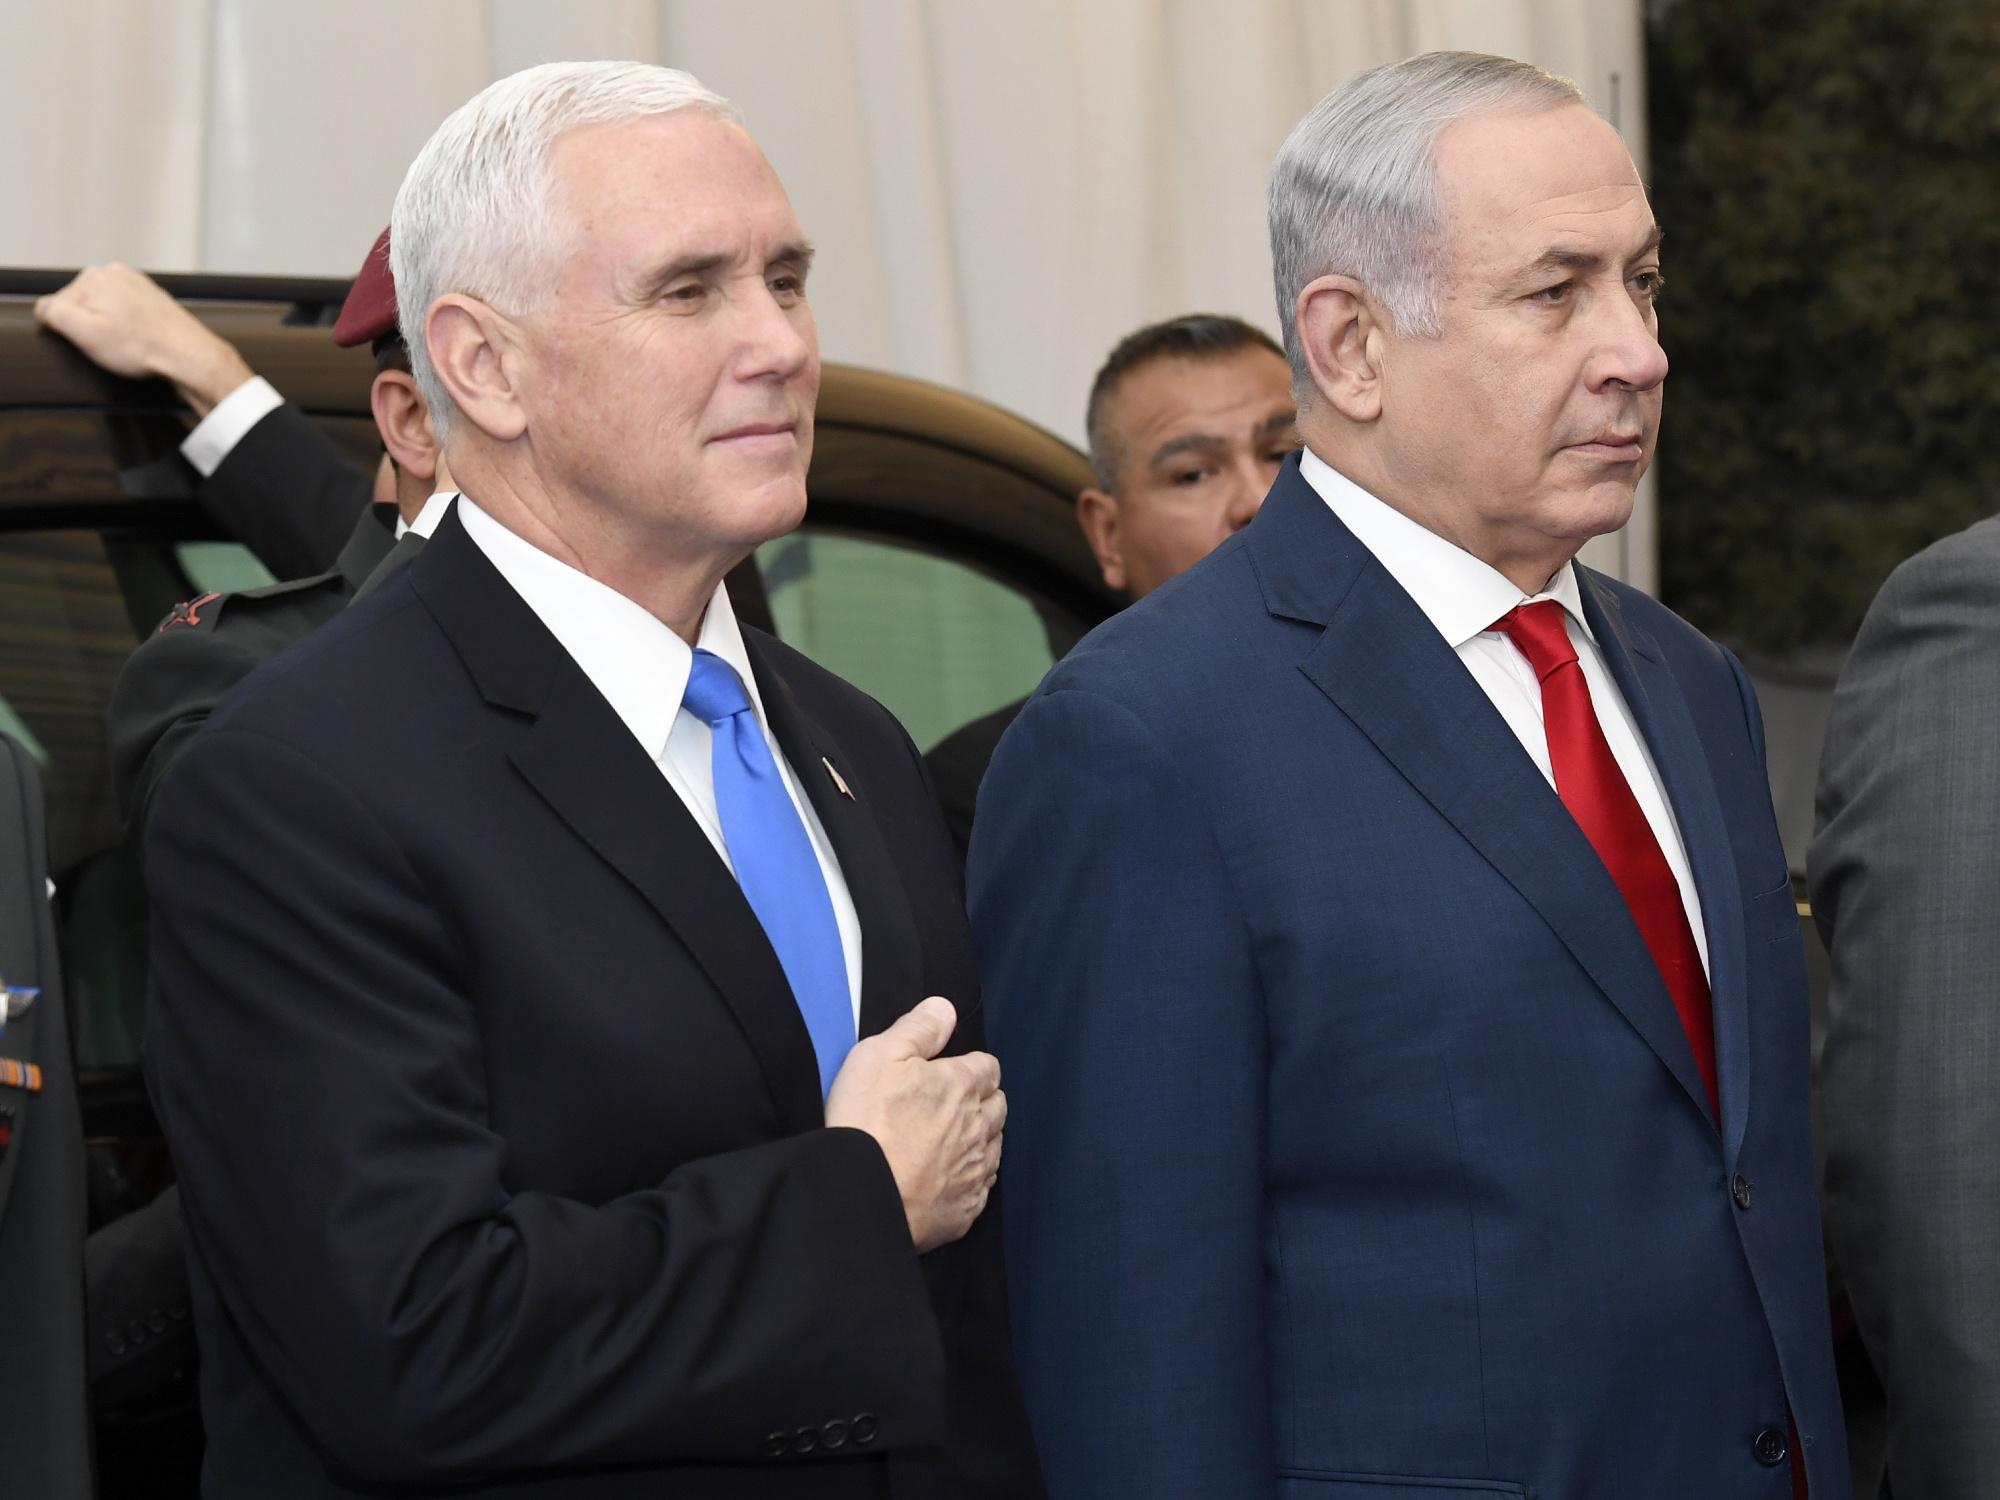 Netanyahu lancia l'ennesima guerra per procura basata su menzogne